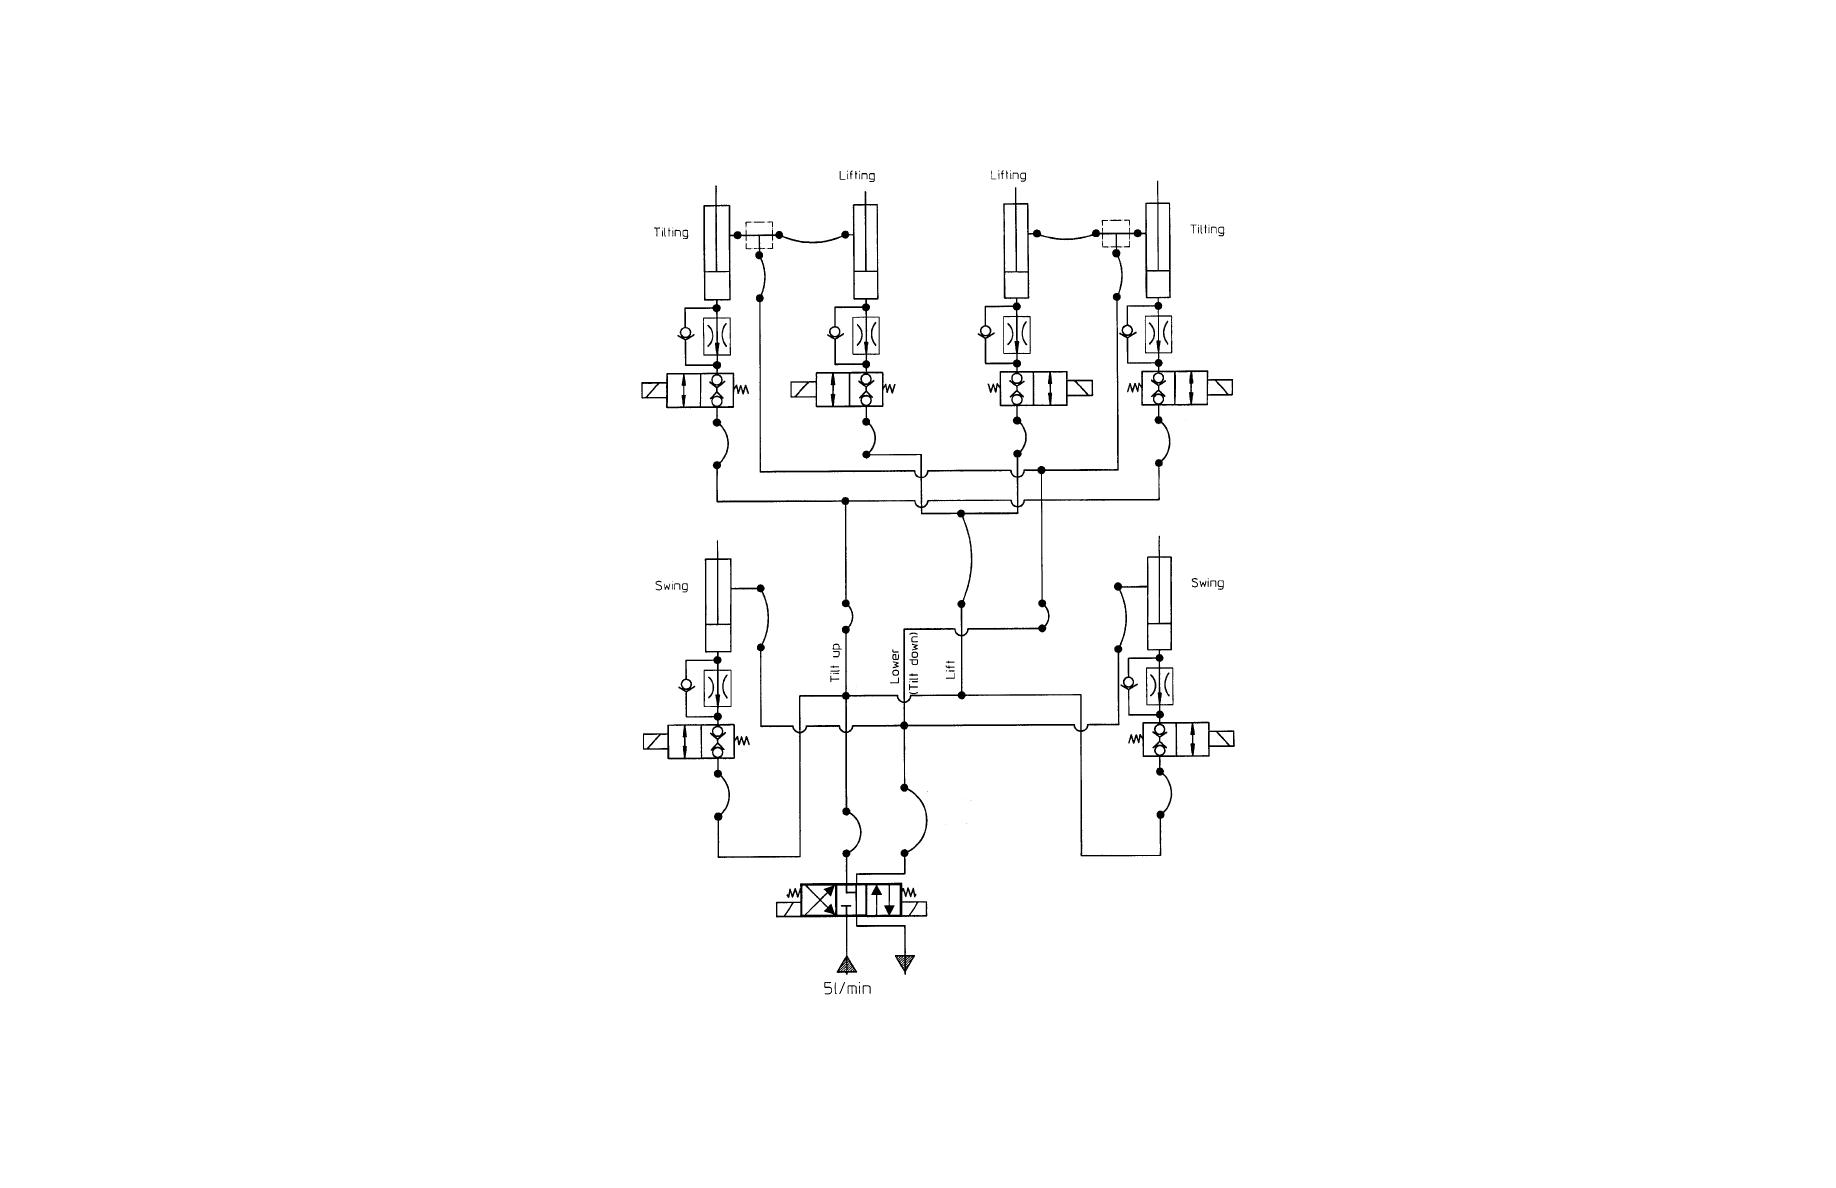 tail lift wiring diagram